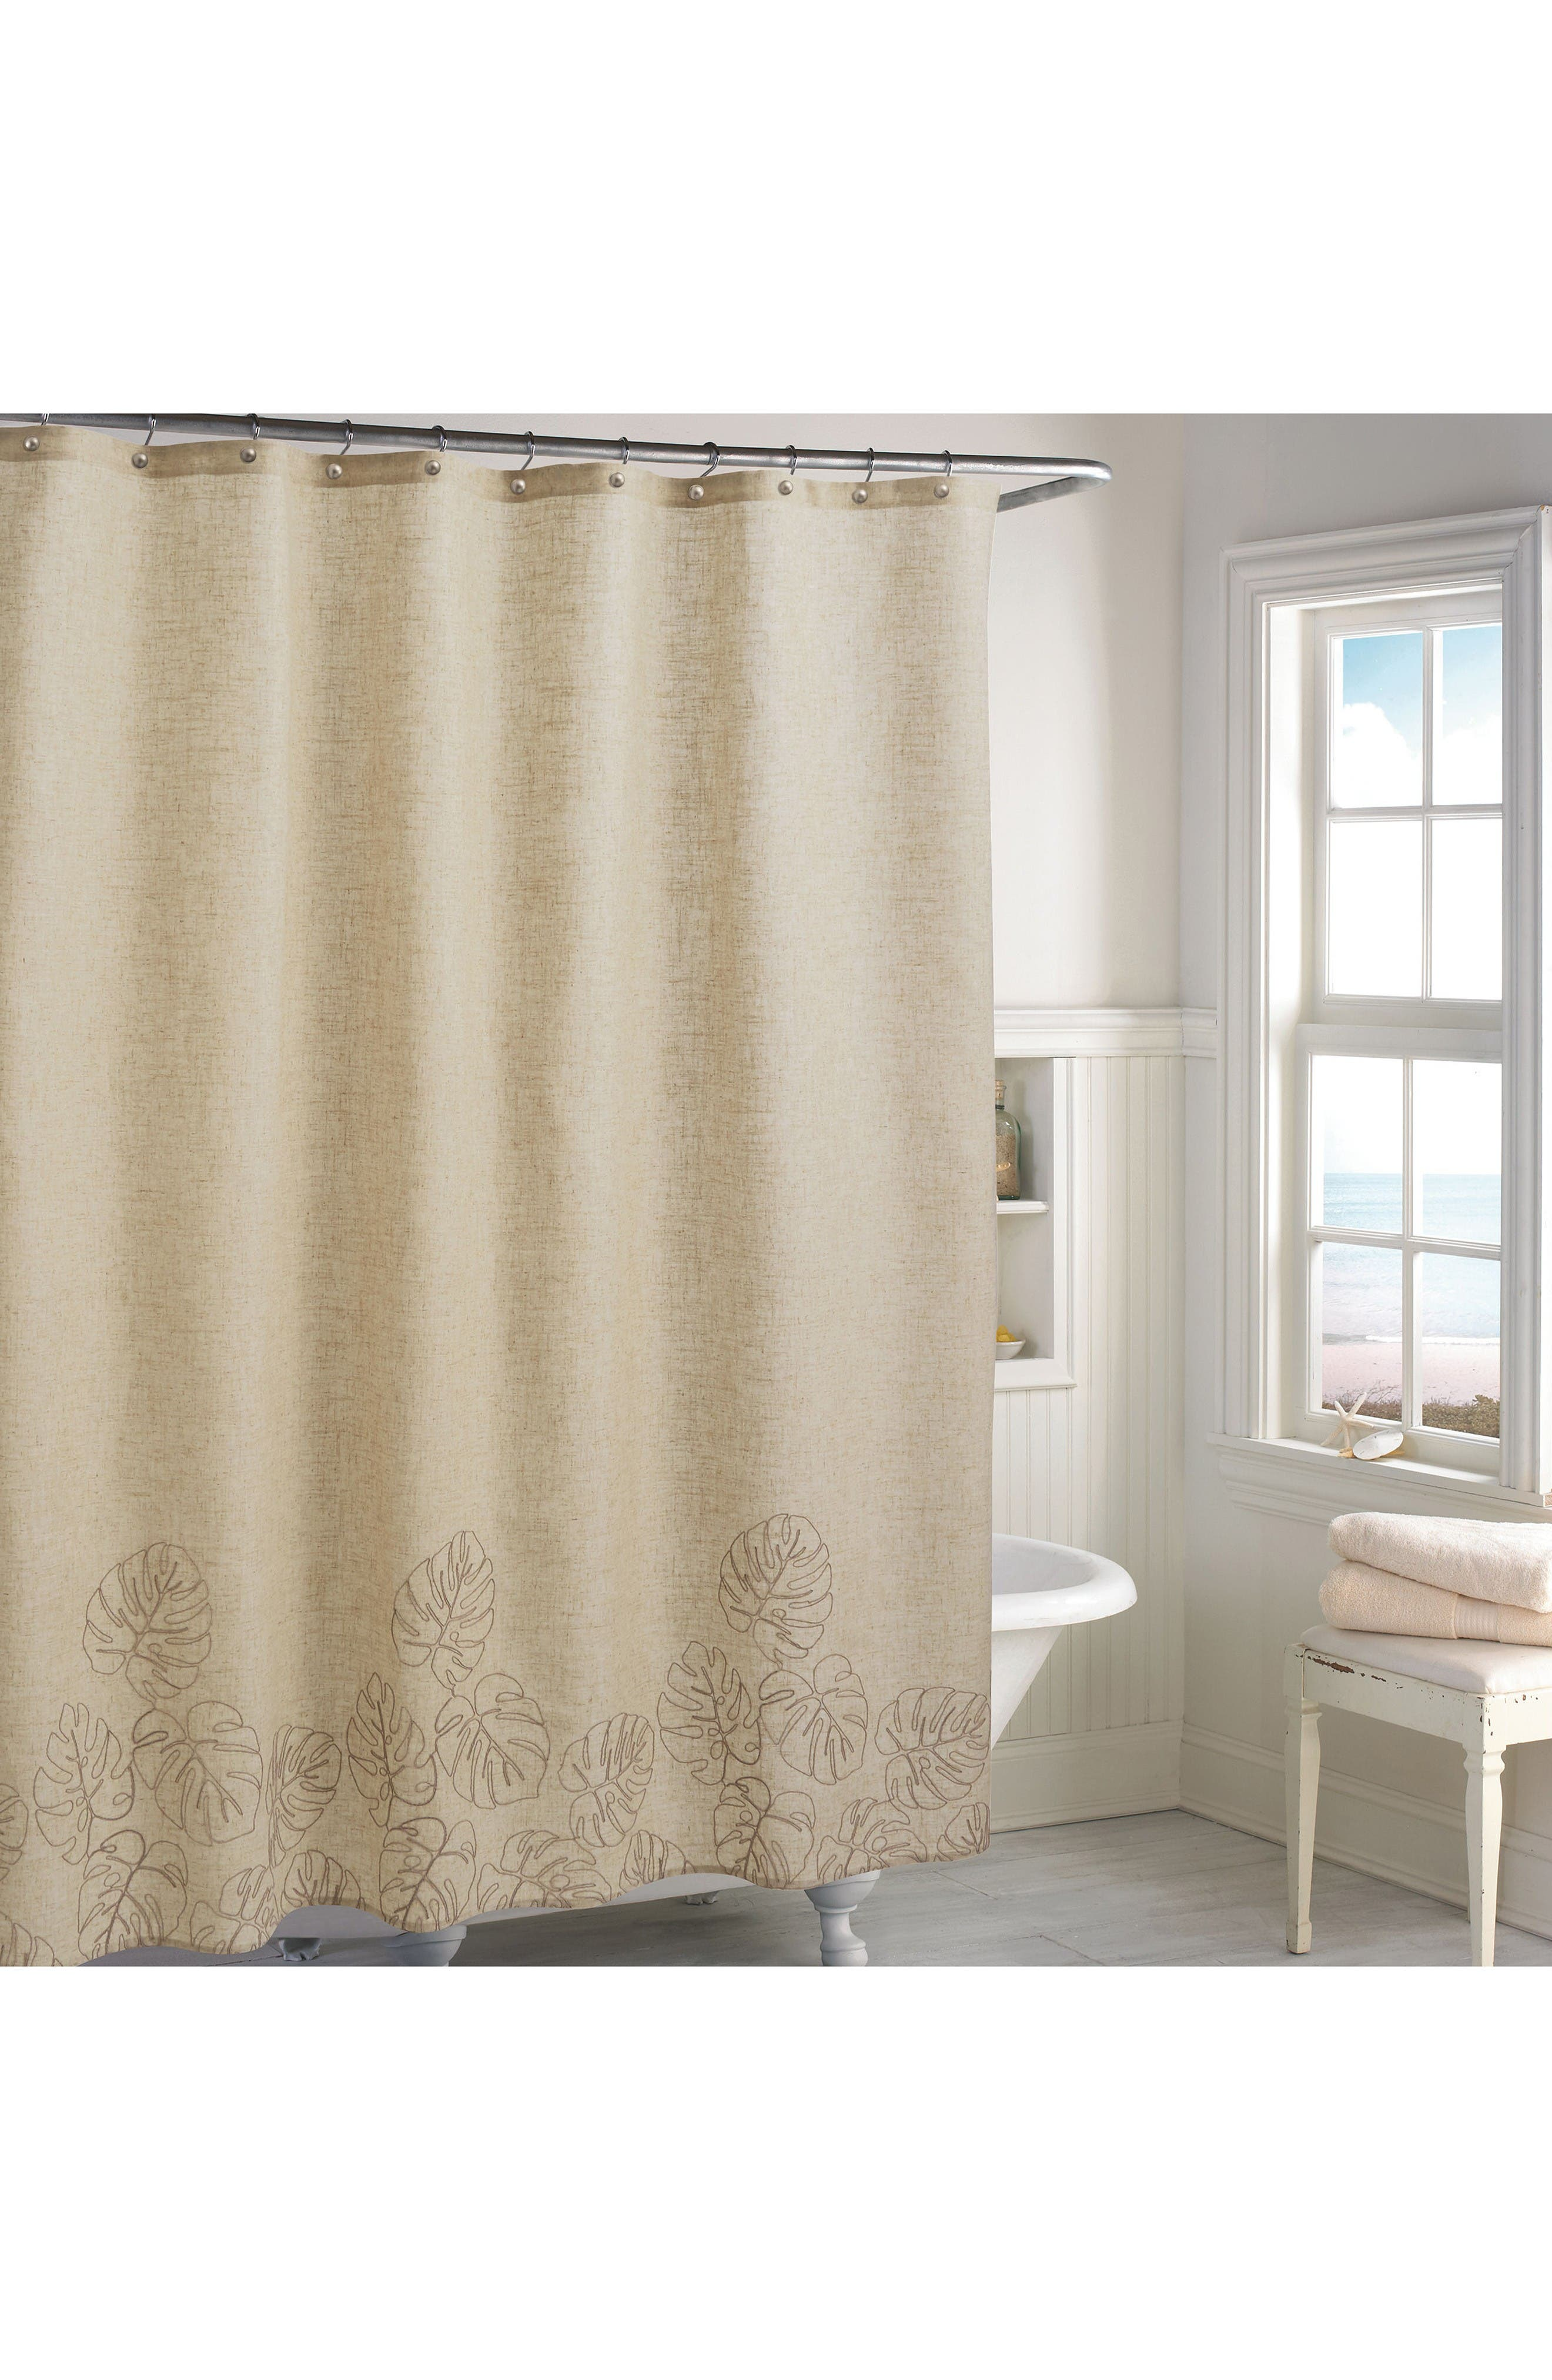 Destinations Panama Shower Curtain